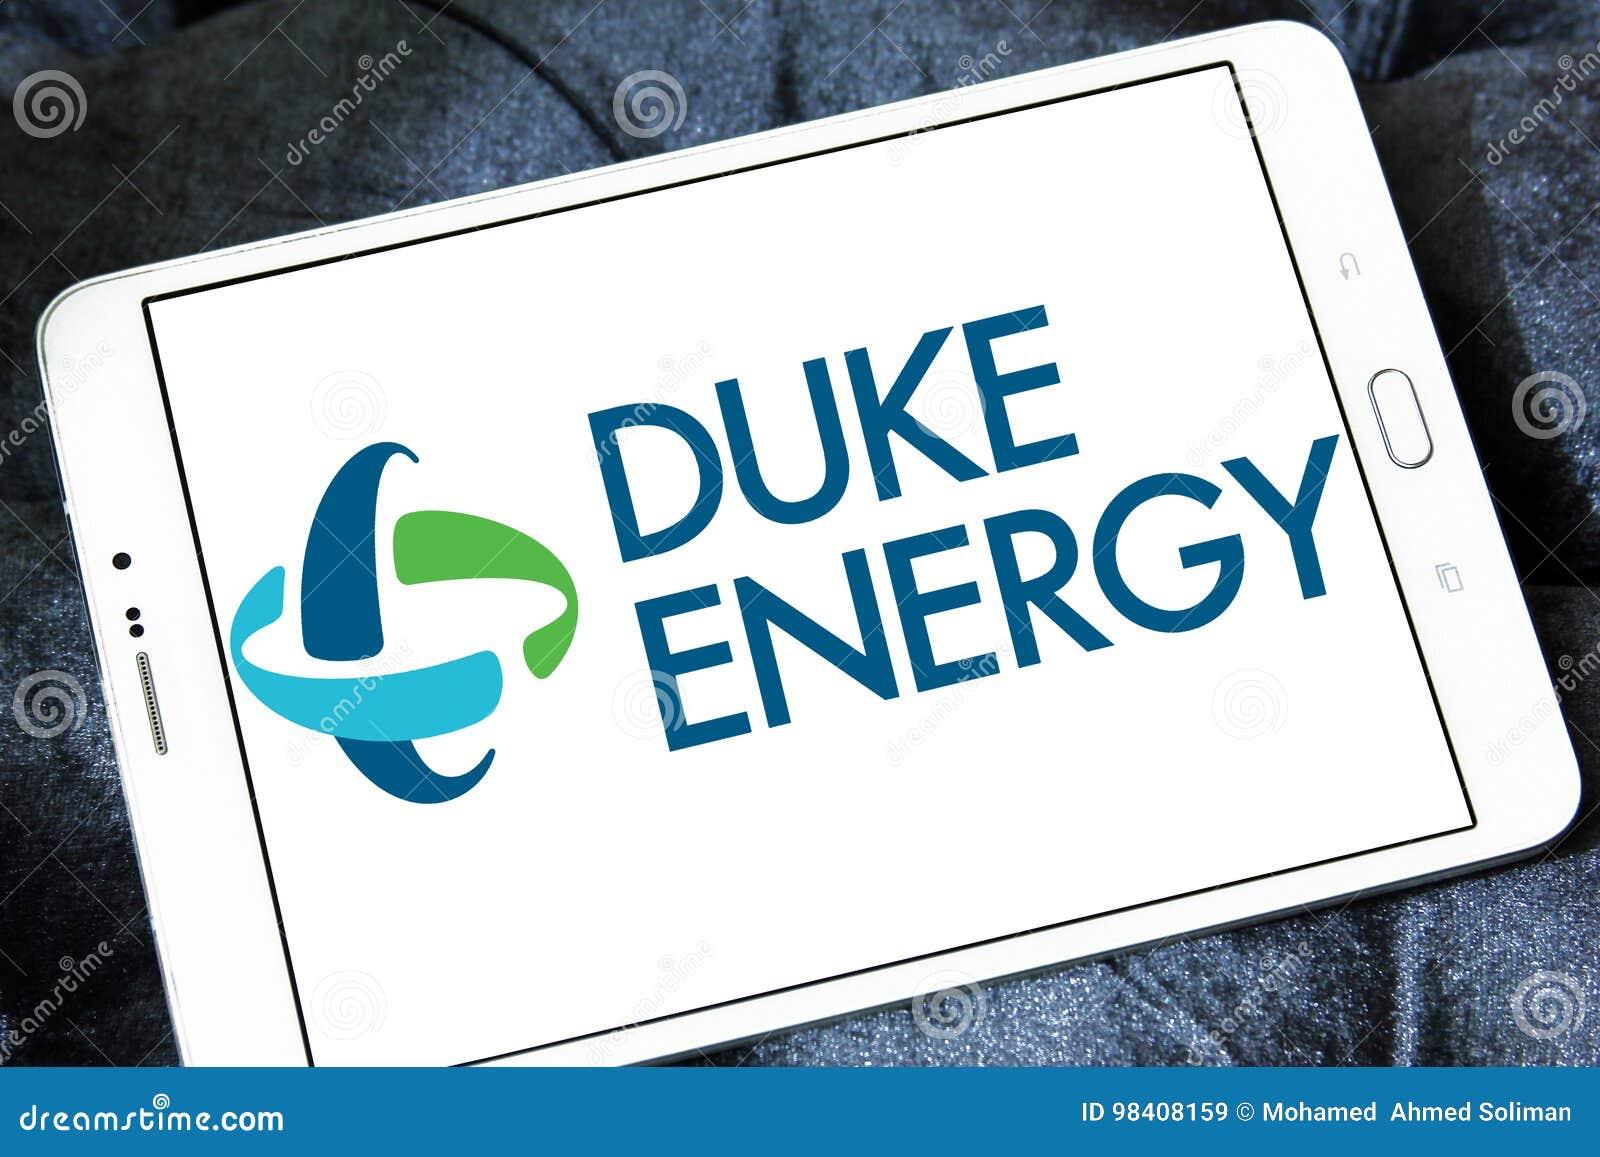 Duke energy company logo editorial stock image  Image of